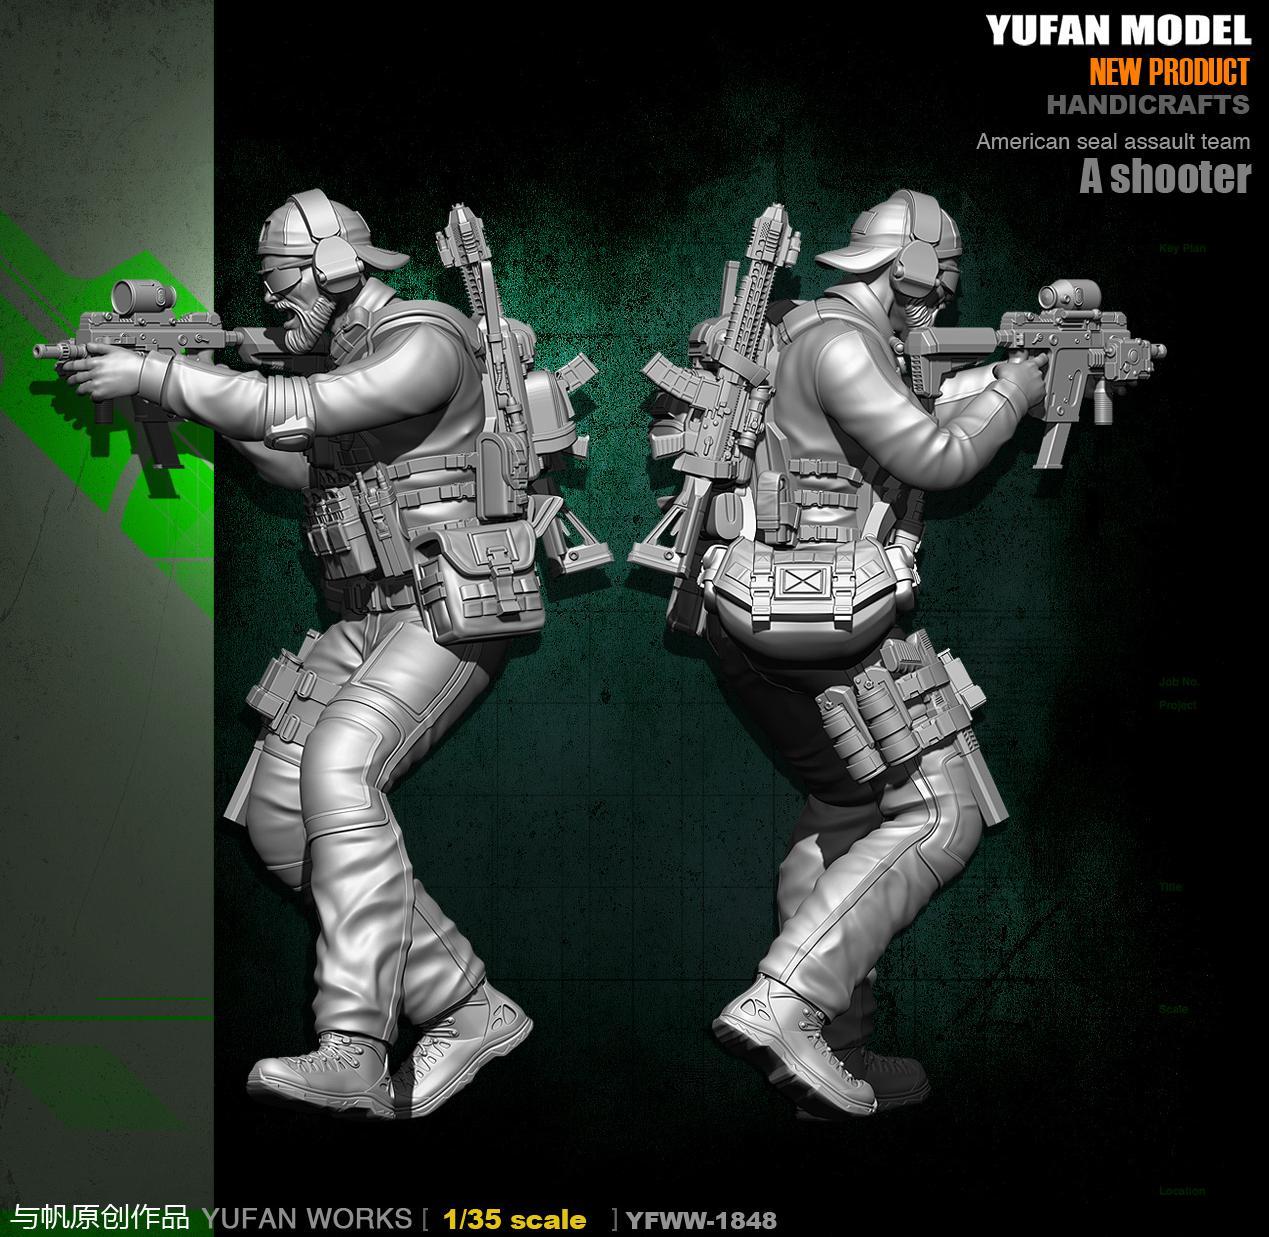 Yufan Model 1/35 Model Kit Resin Soldie US Army YFWW35-1848